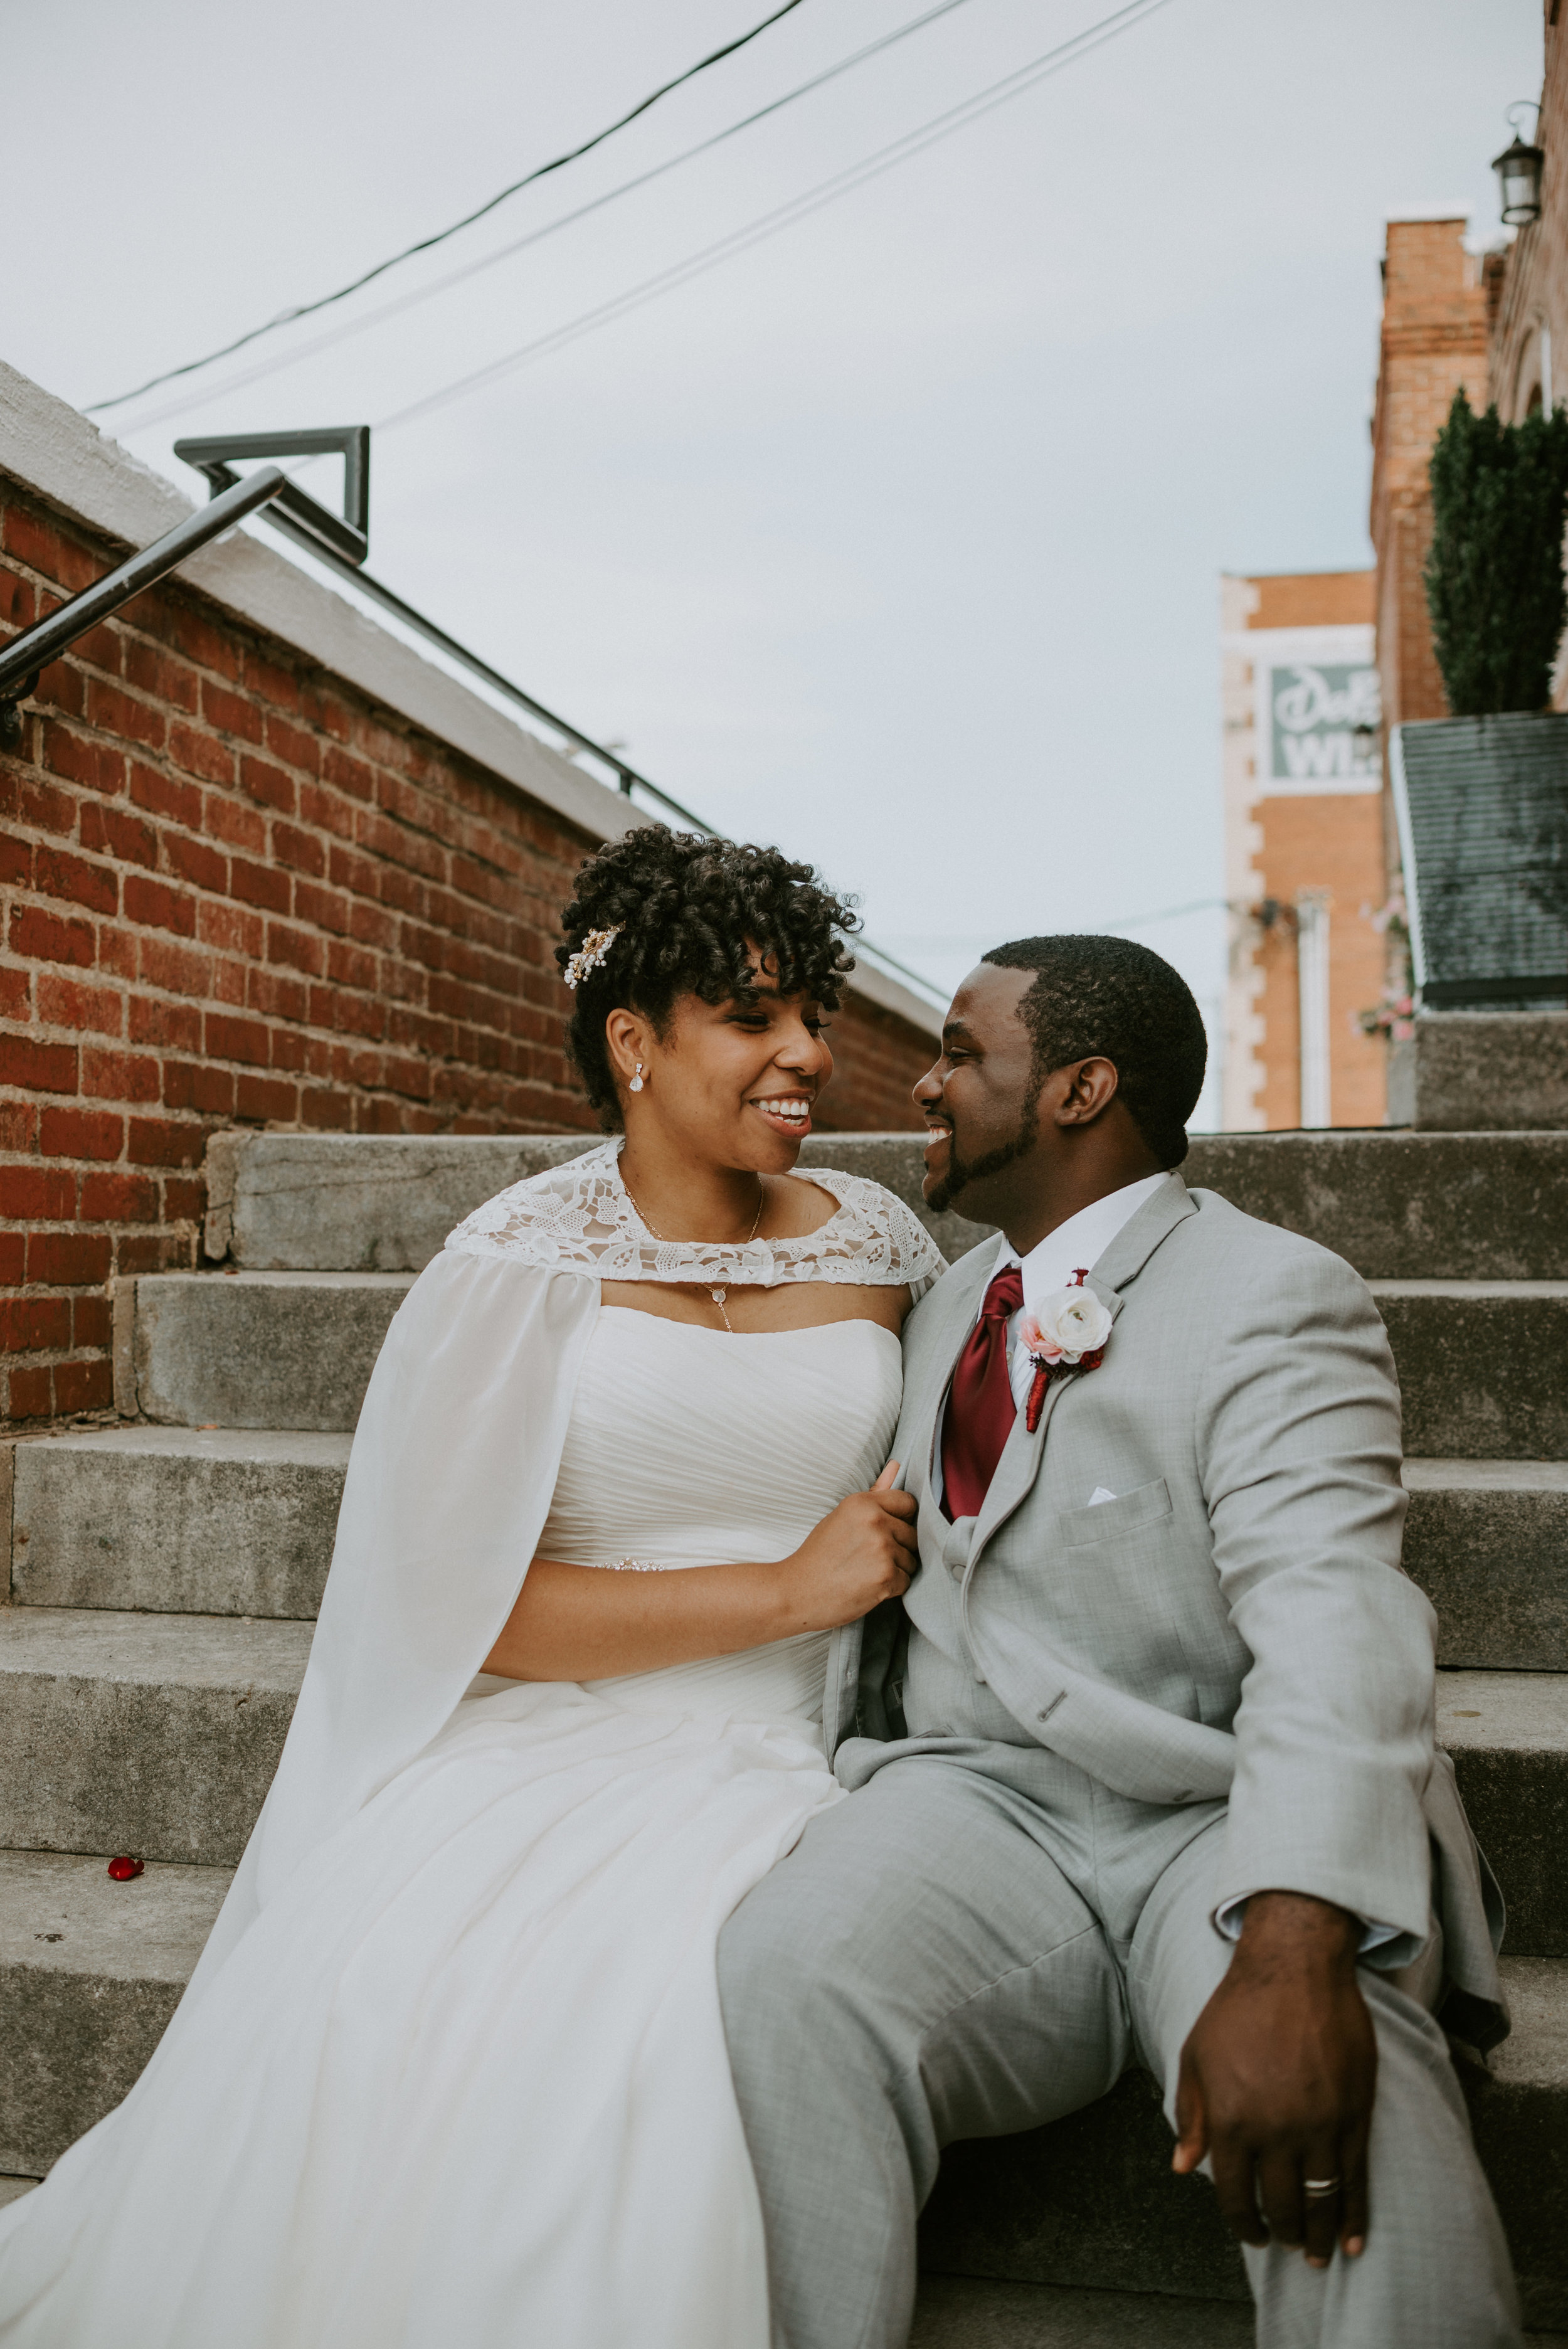 WonderlyCreative_Wedding_6.7.18_Khara&Dwayne_-712.jpg